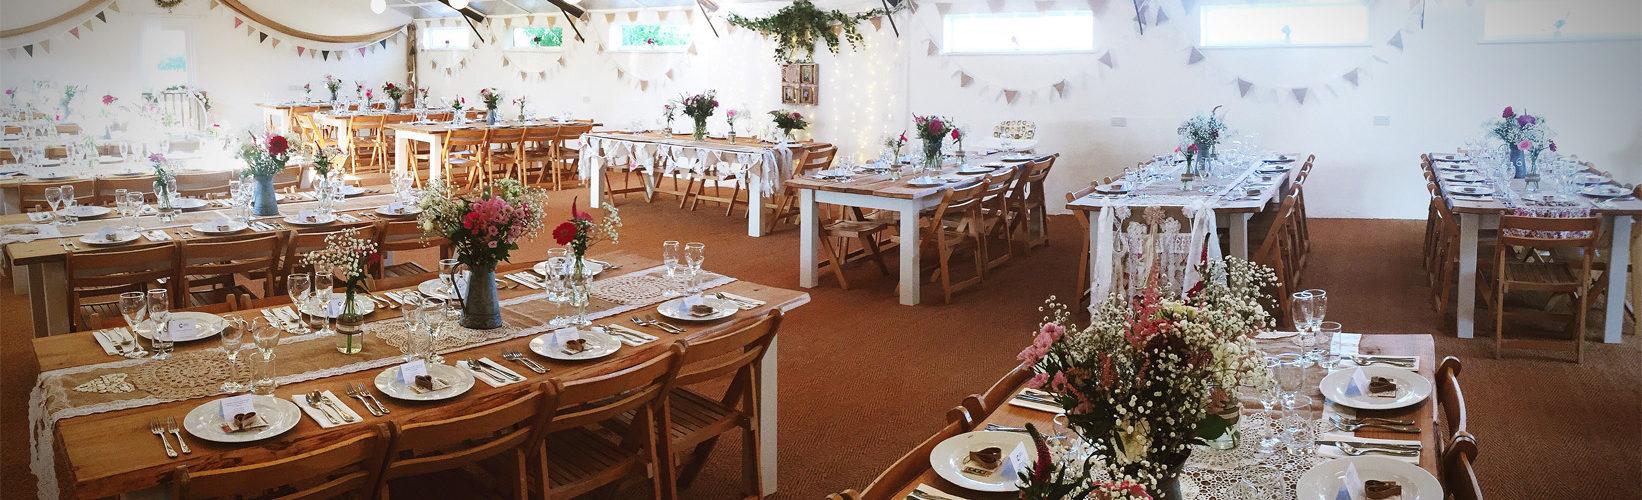 Barn Wedding Venue in Somerset